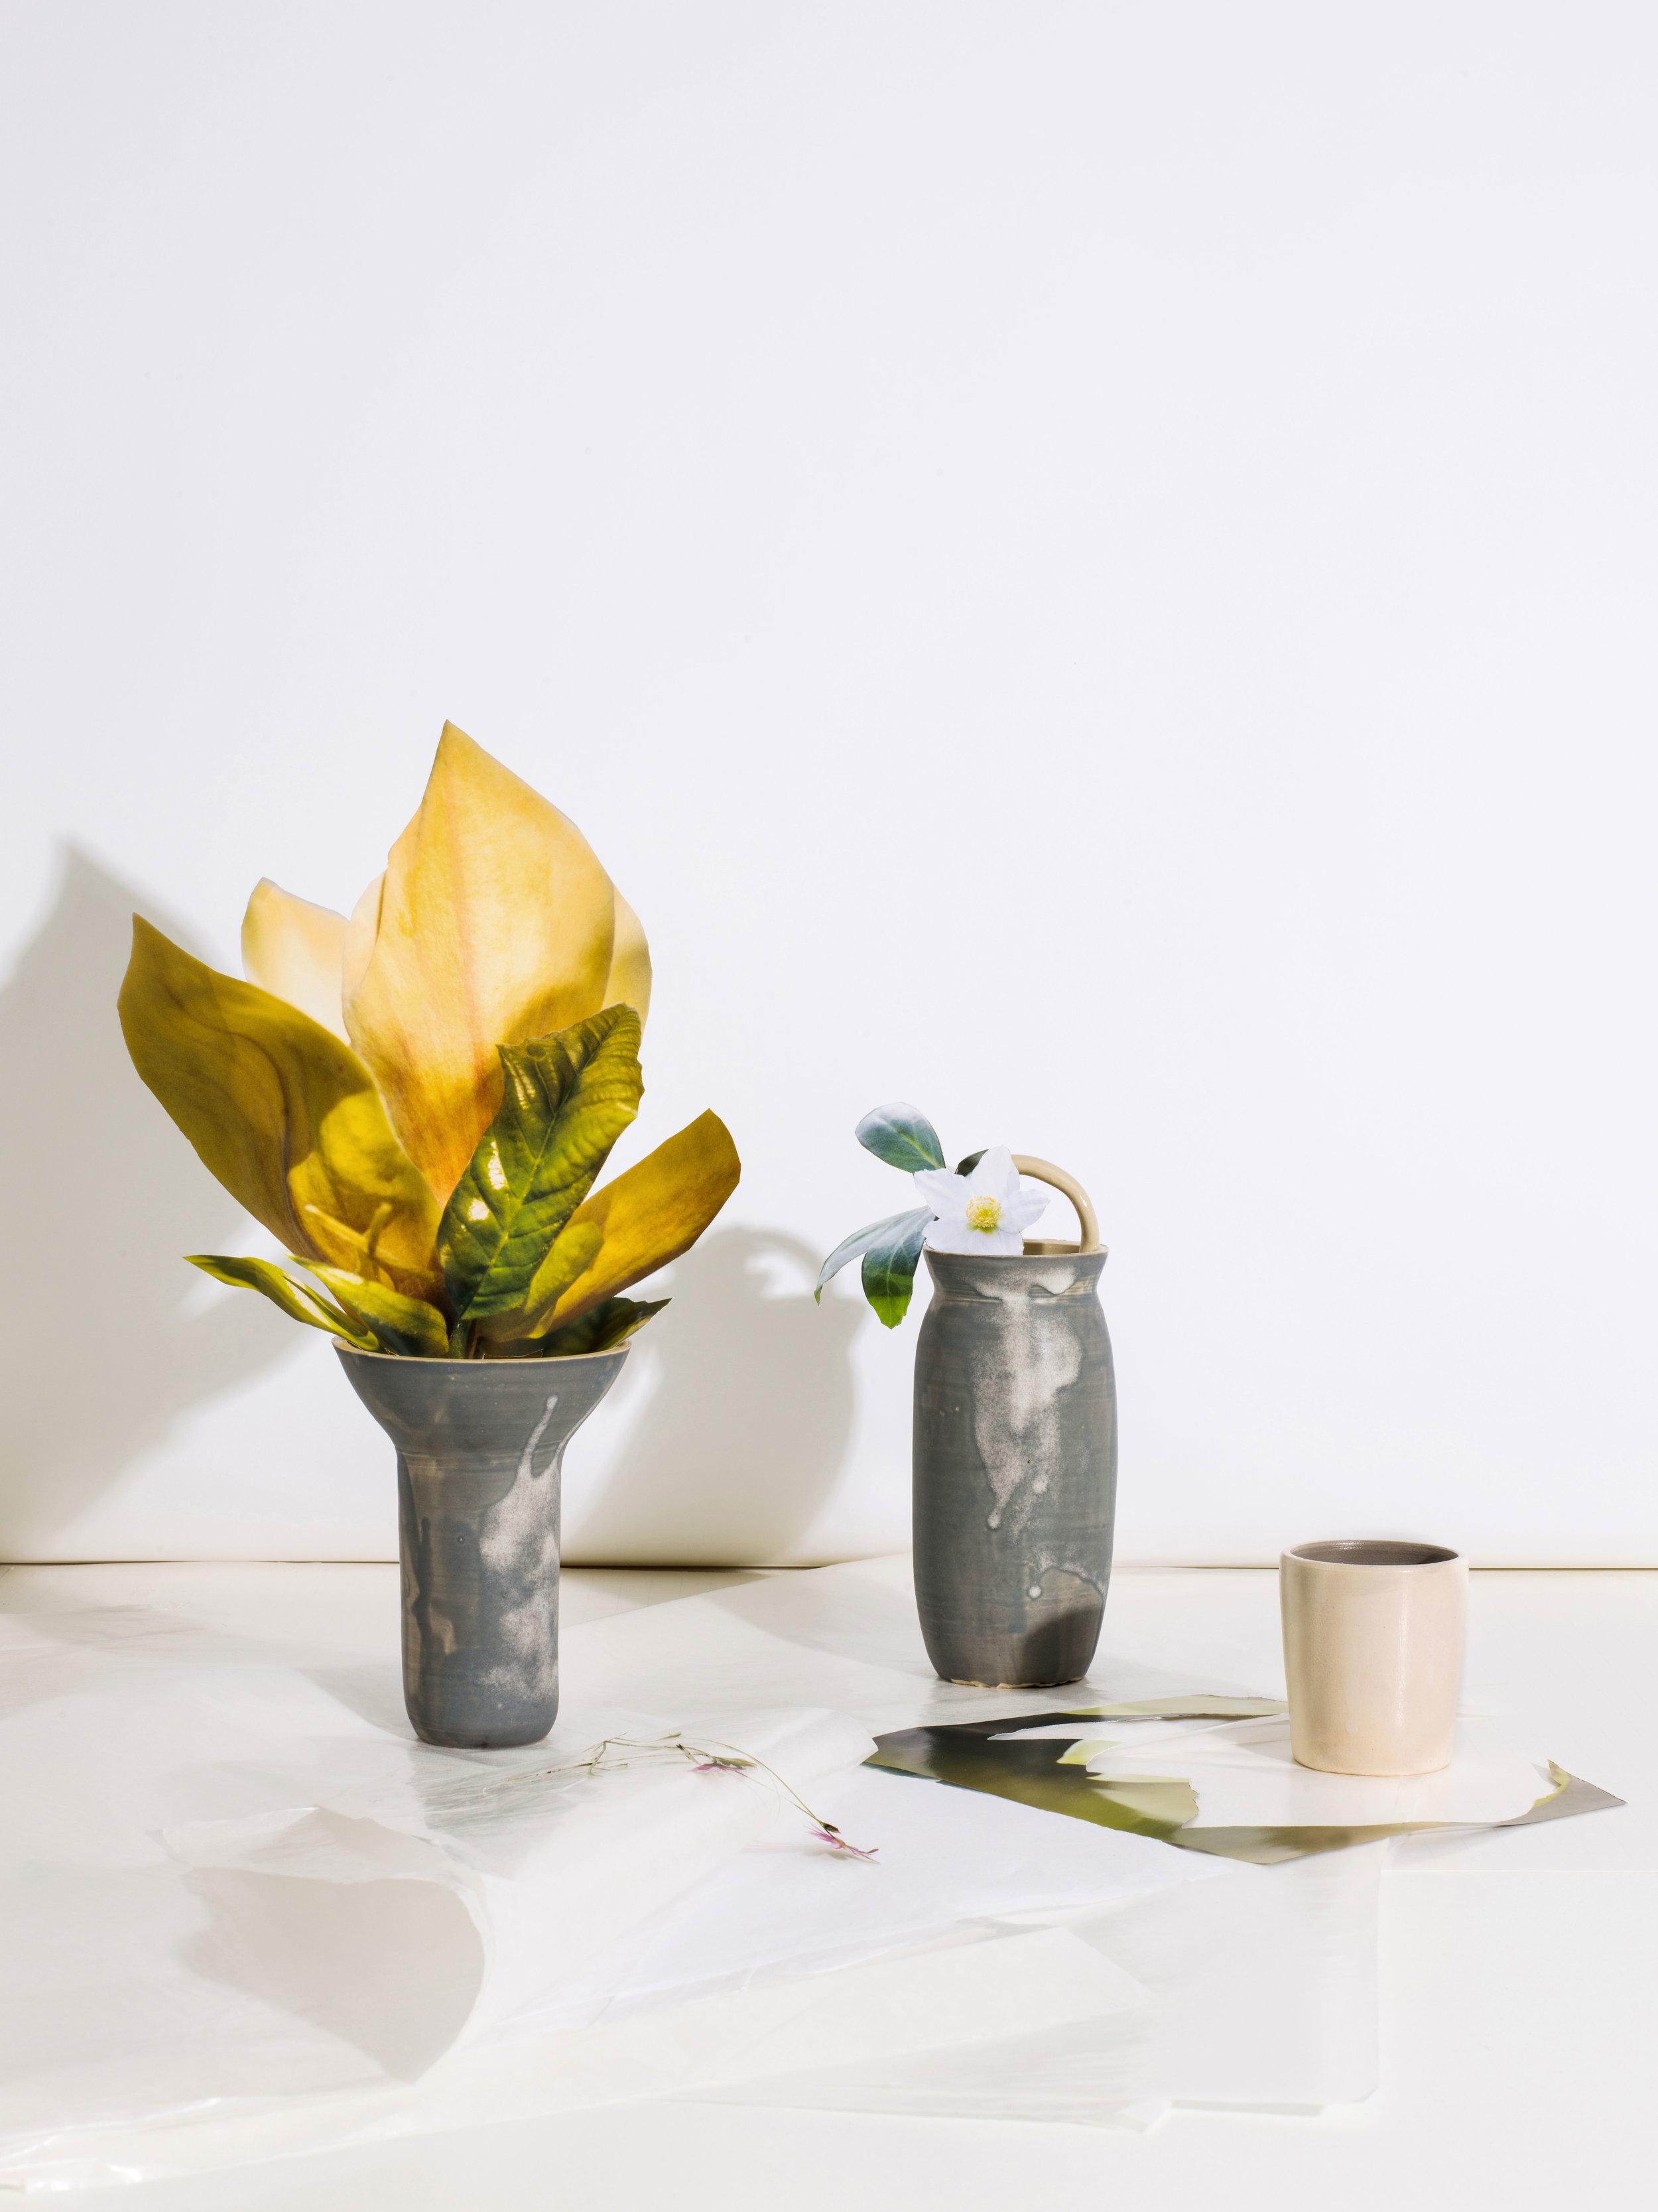 CeramicsShaoChen-1-3.jpg